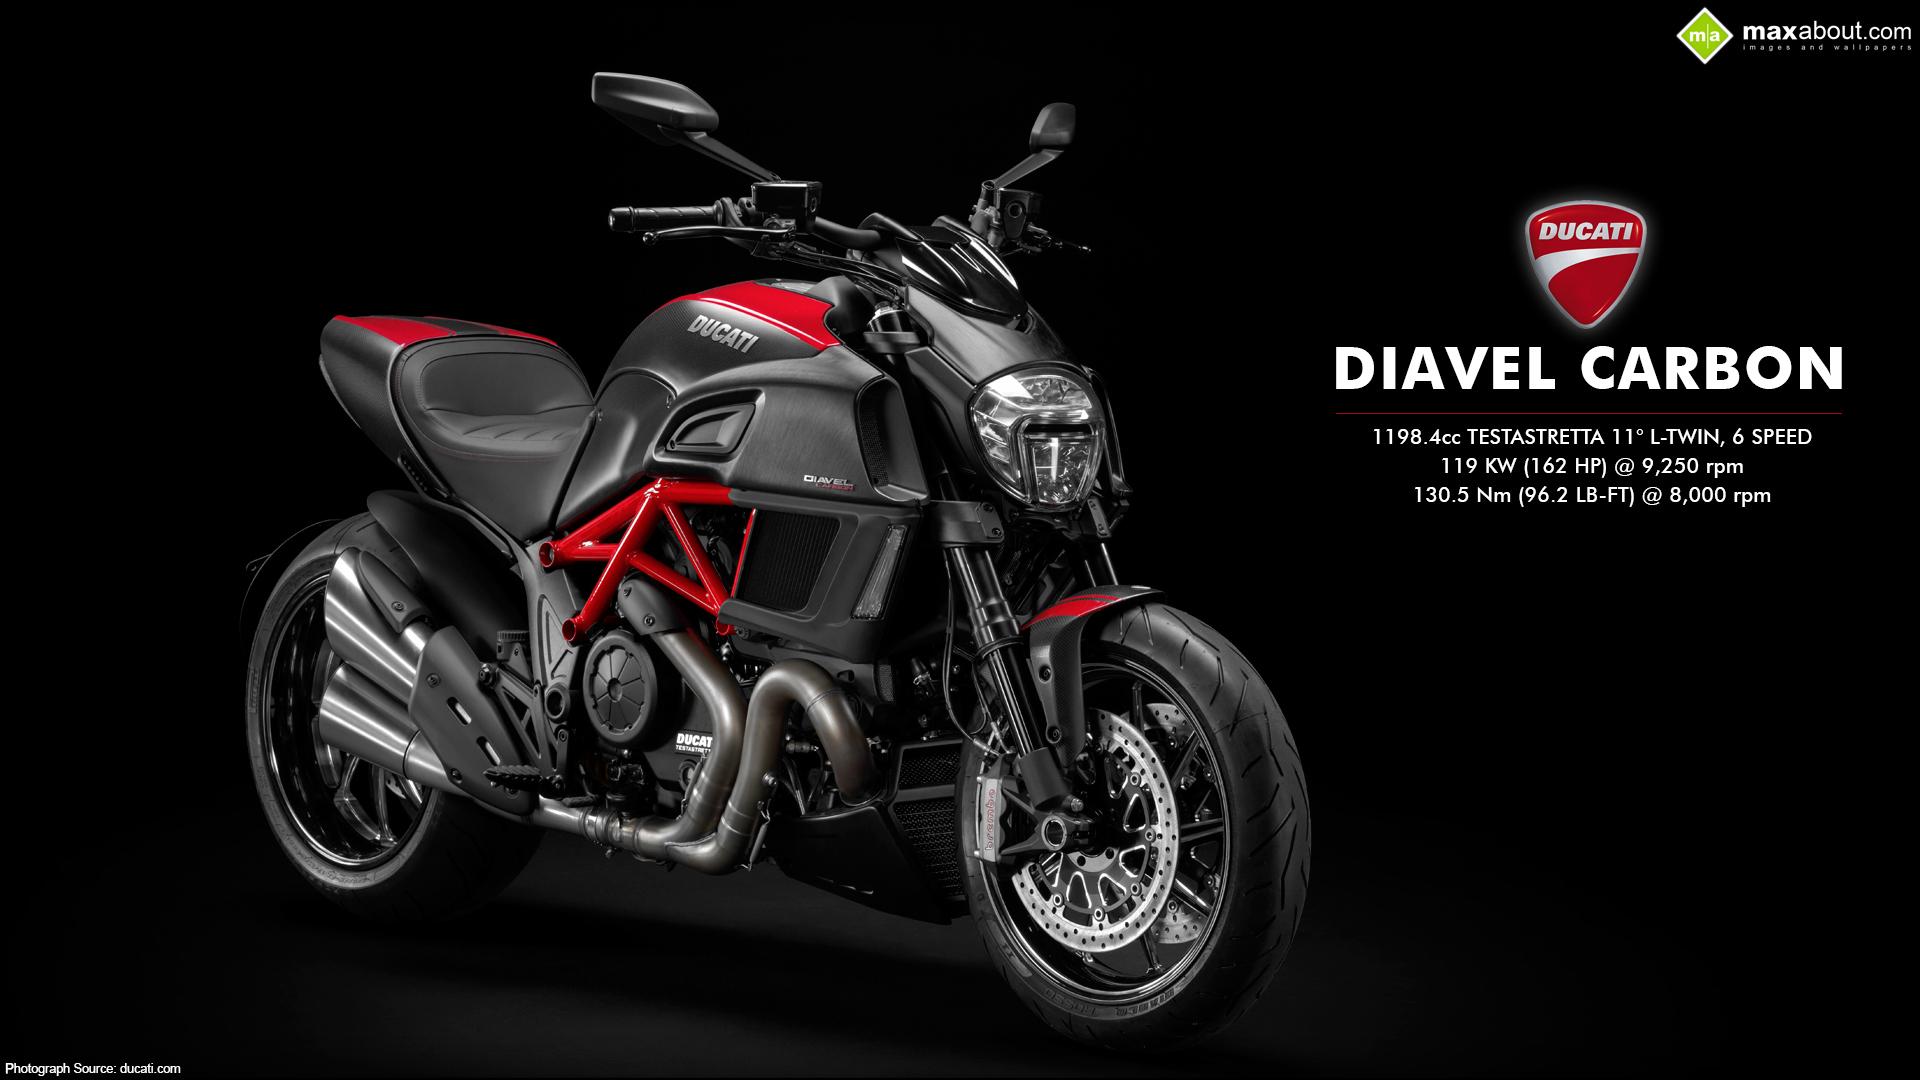 Ducati Ducati Diavel Motorcycle Motorcycles 1920x1080 1920x1080